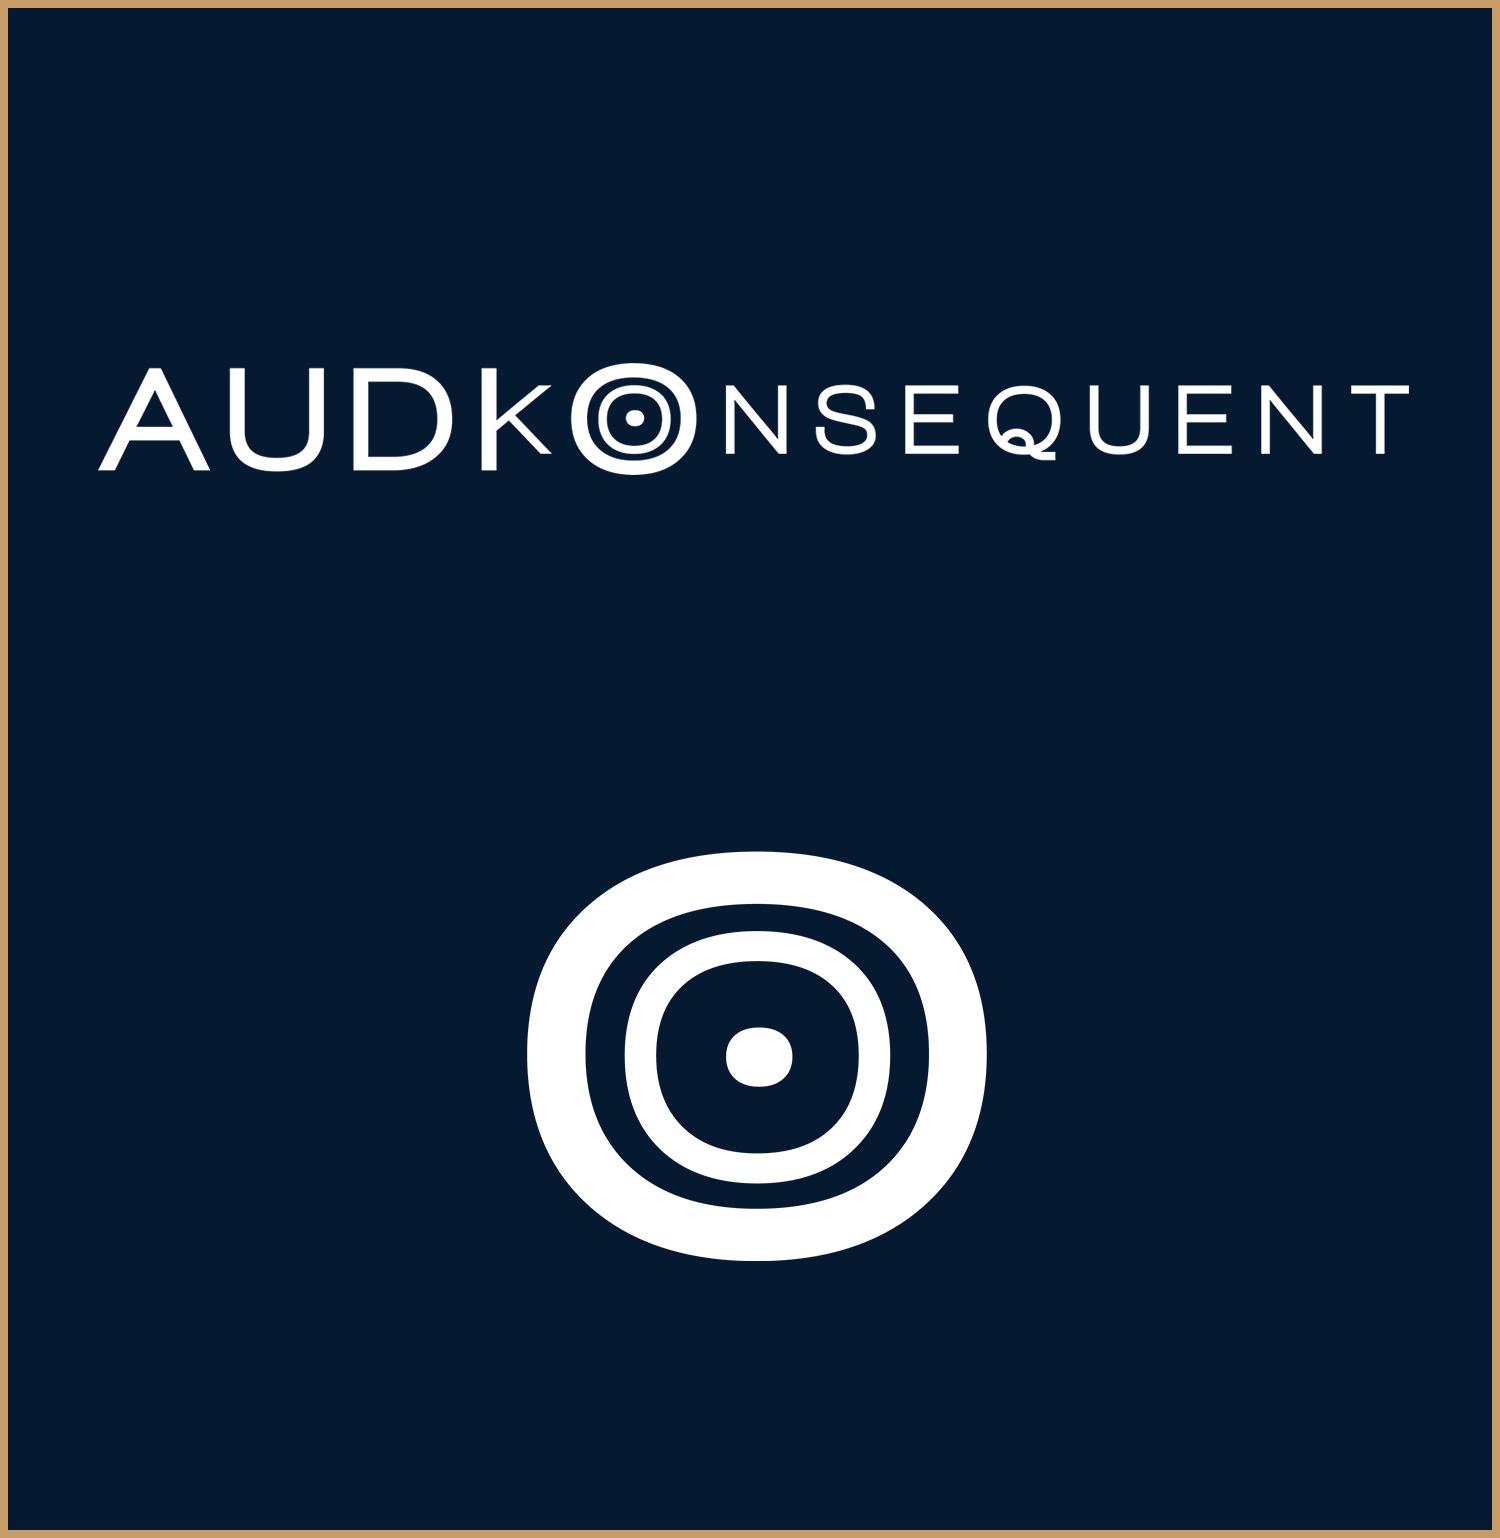 Audiokonsequent_#1_logodesign